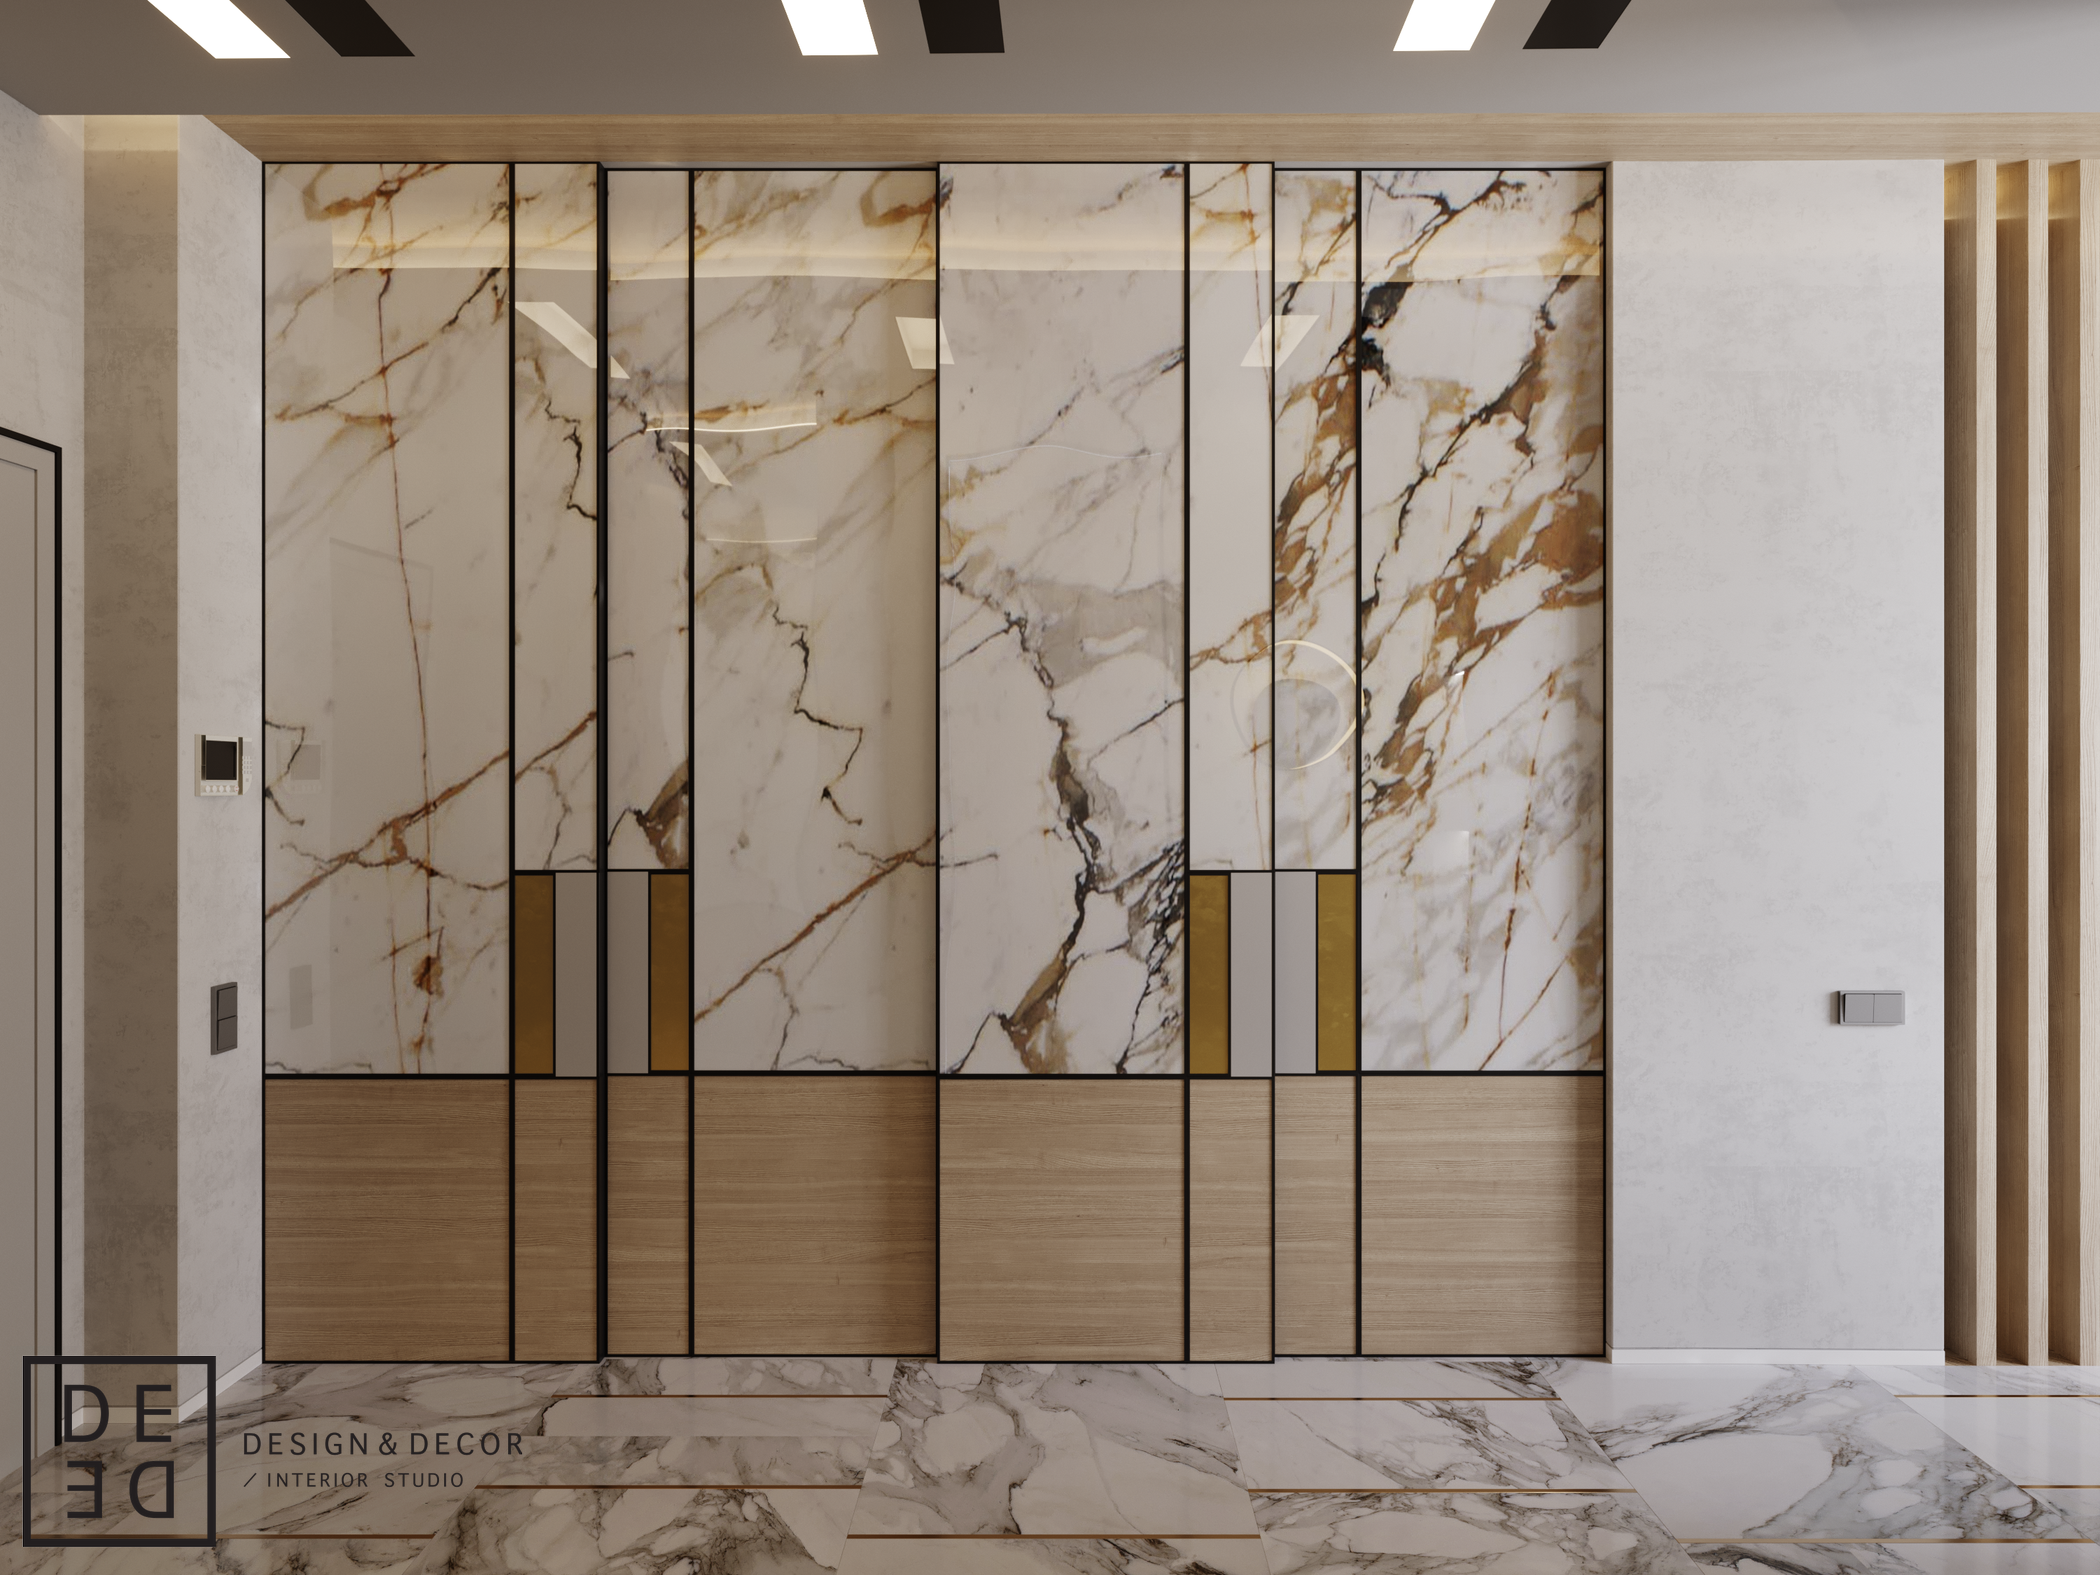 Homedecor interiorideas dedeproject hallway hallwayideas